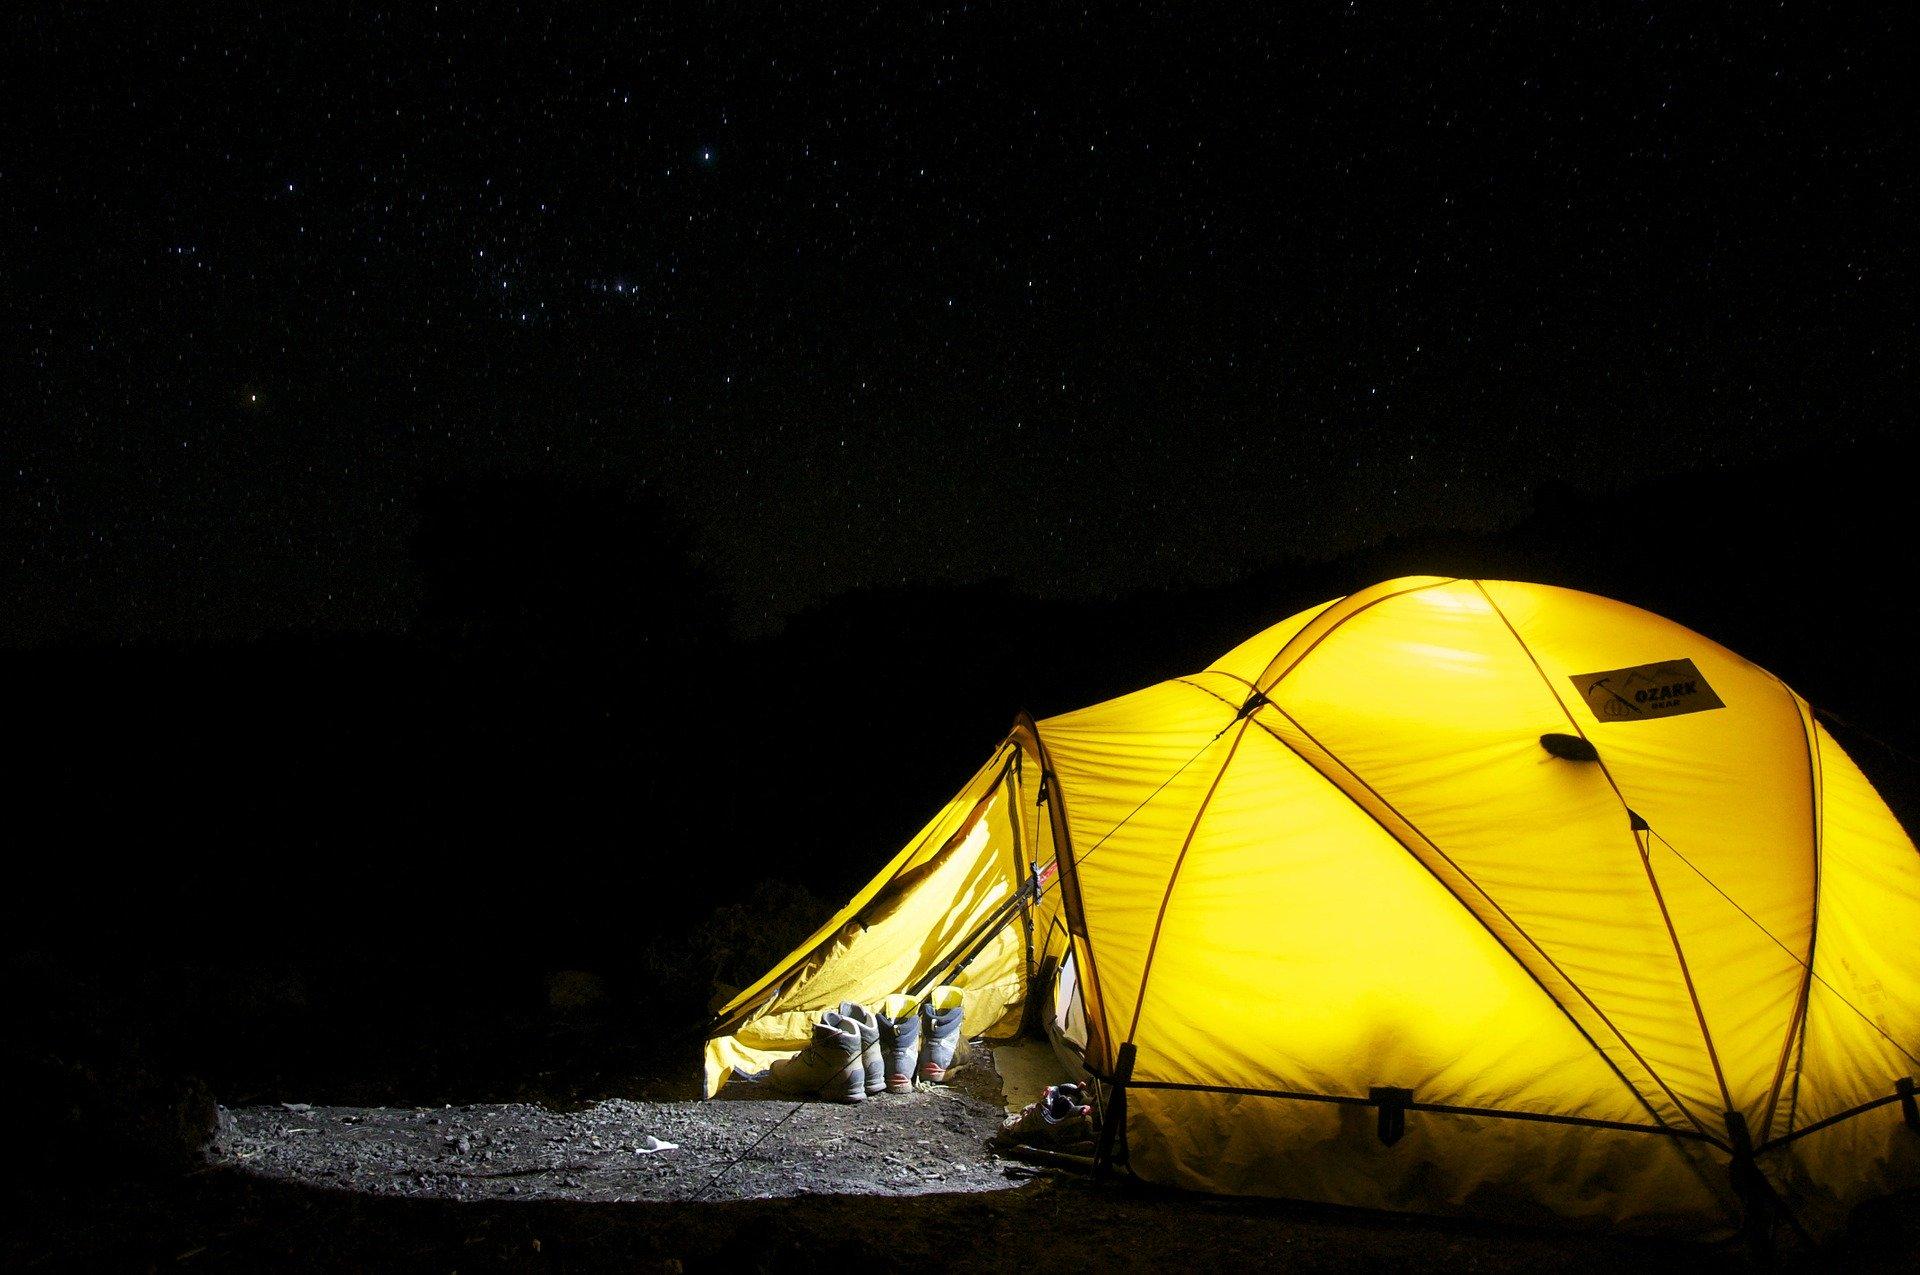 camping i mørket